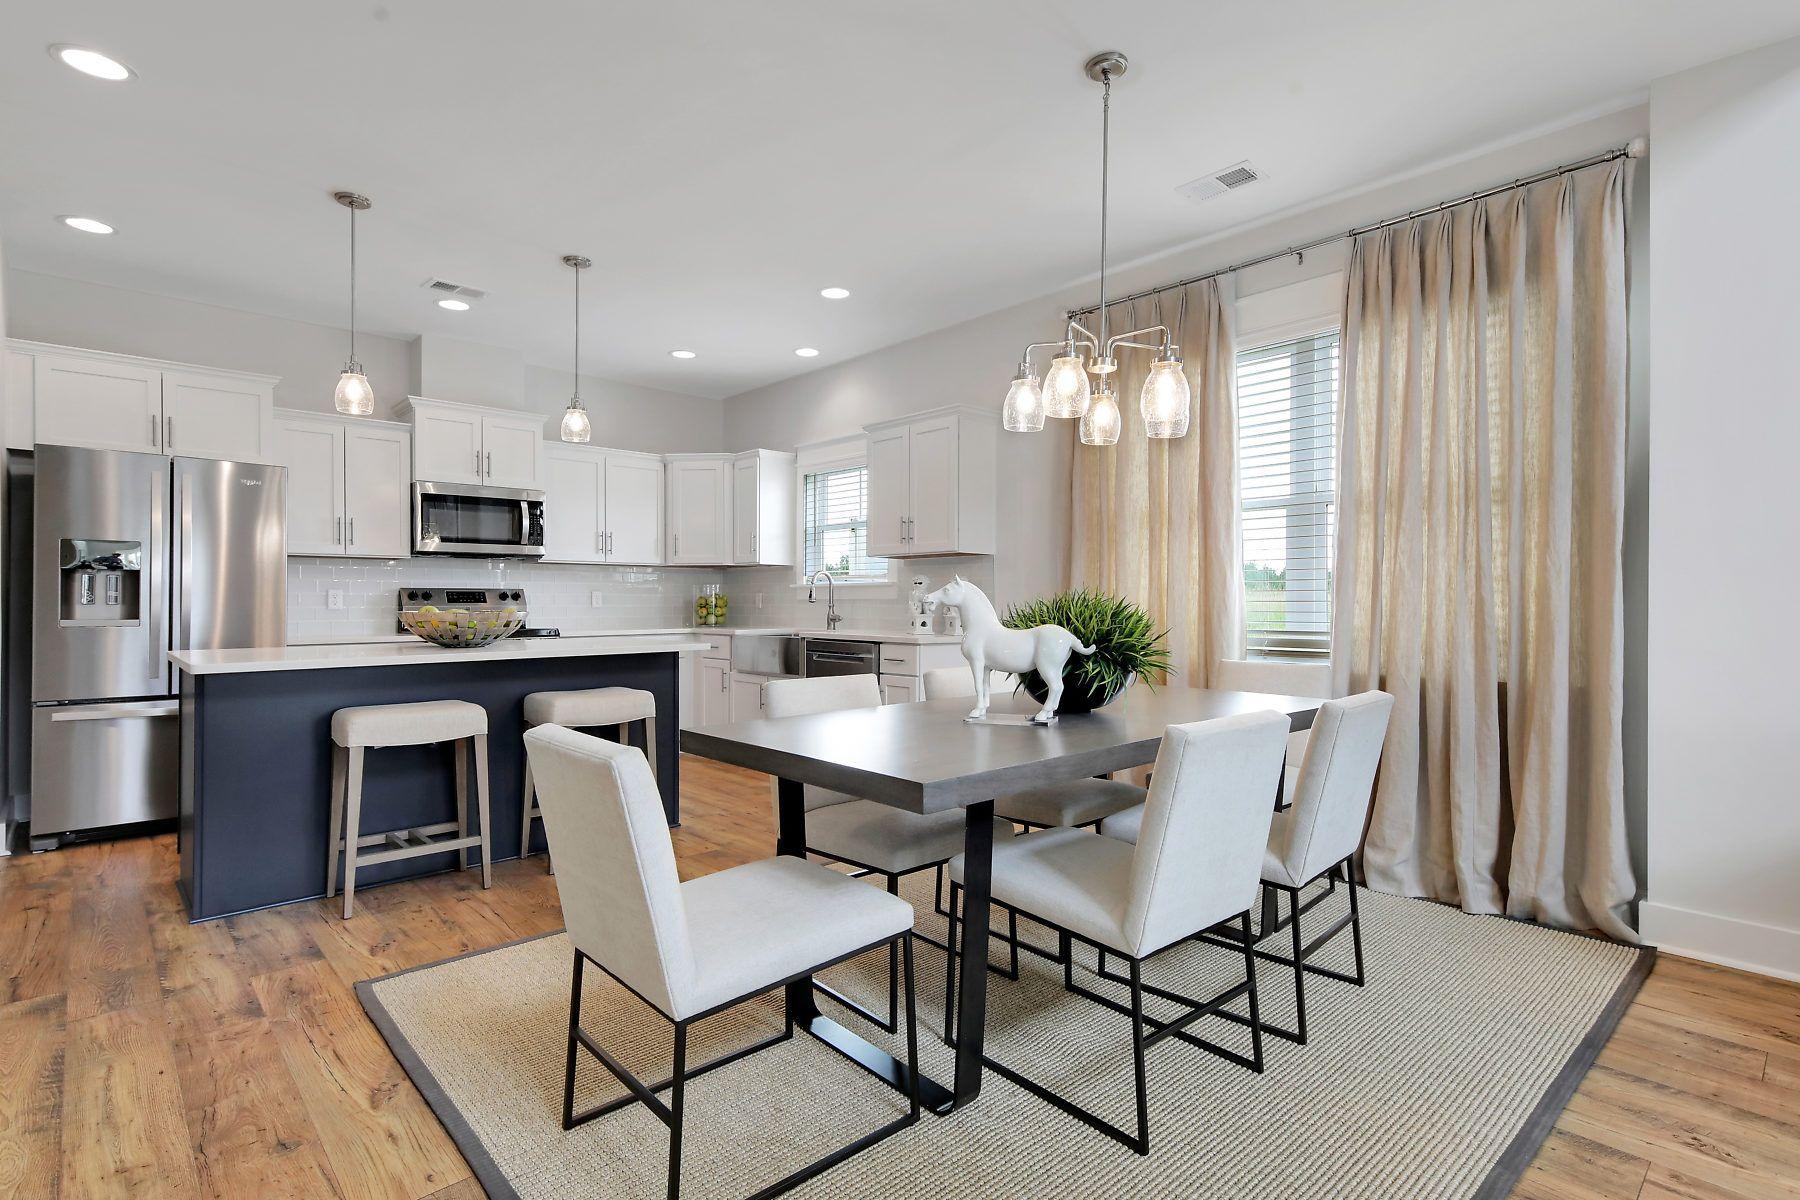 The Edisto Kitchen and Dining Space:The Edisto Kitchen and Dining Space